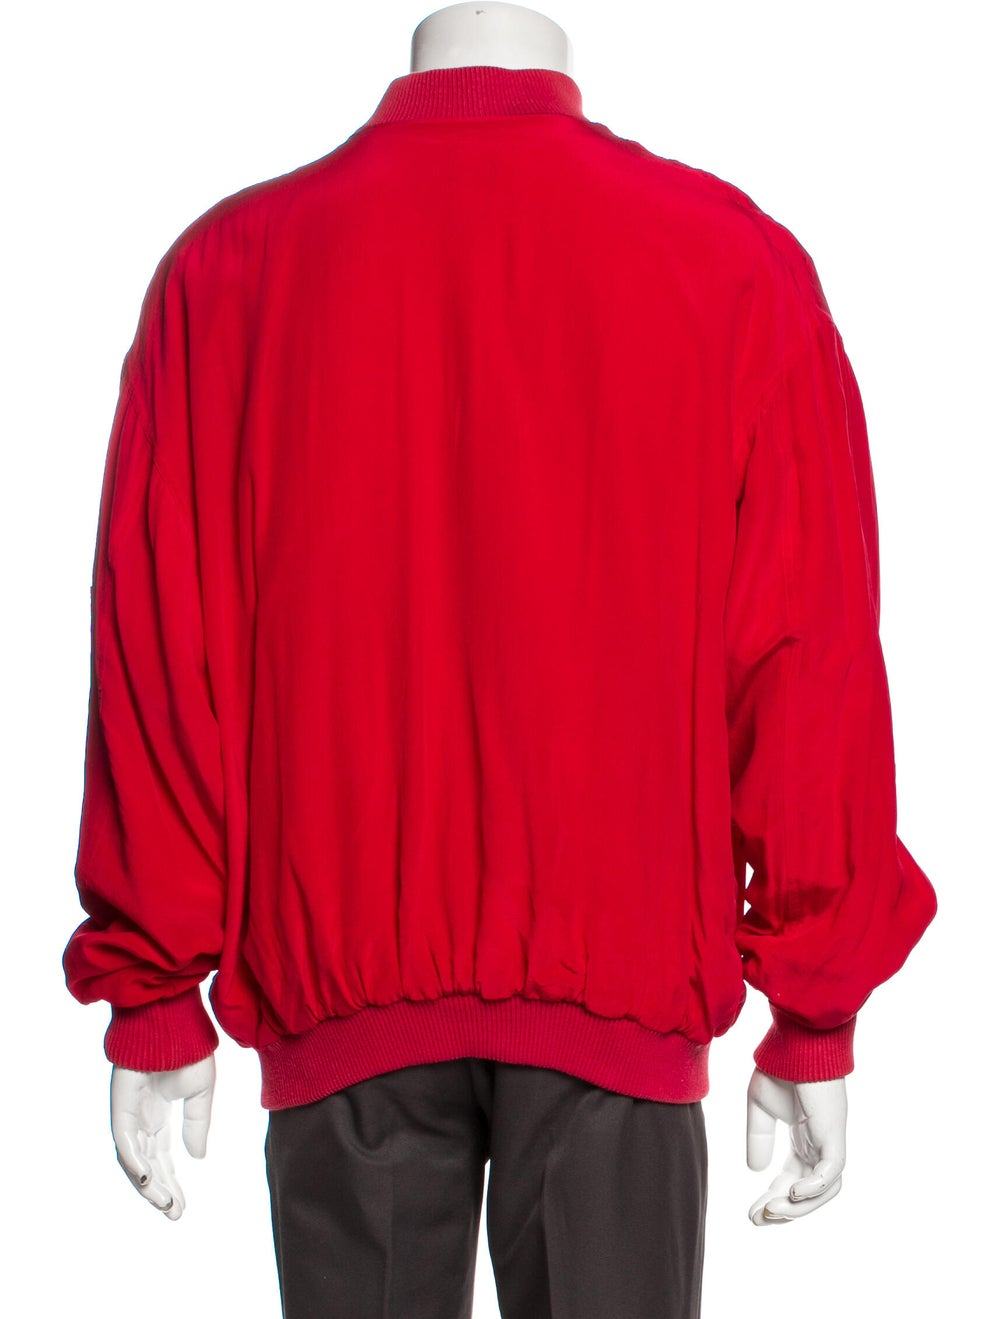 Go Silk Silk Bomber Jacket Red - image 3